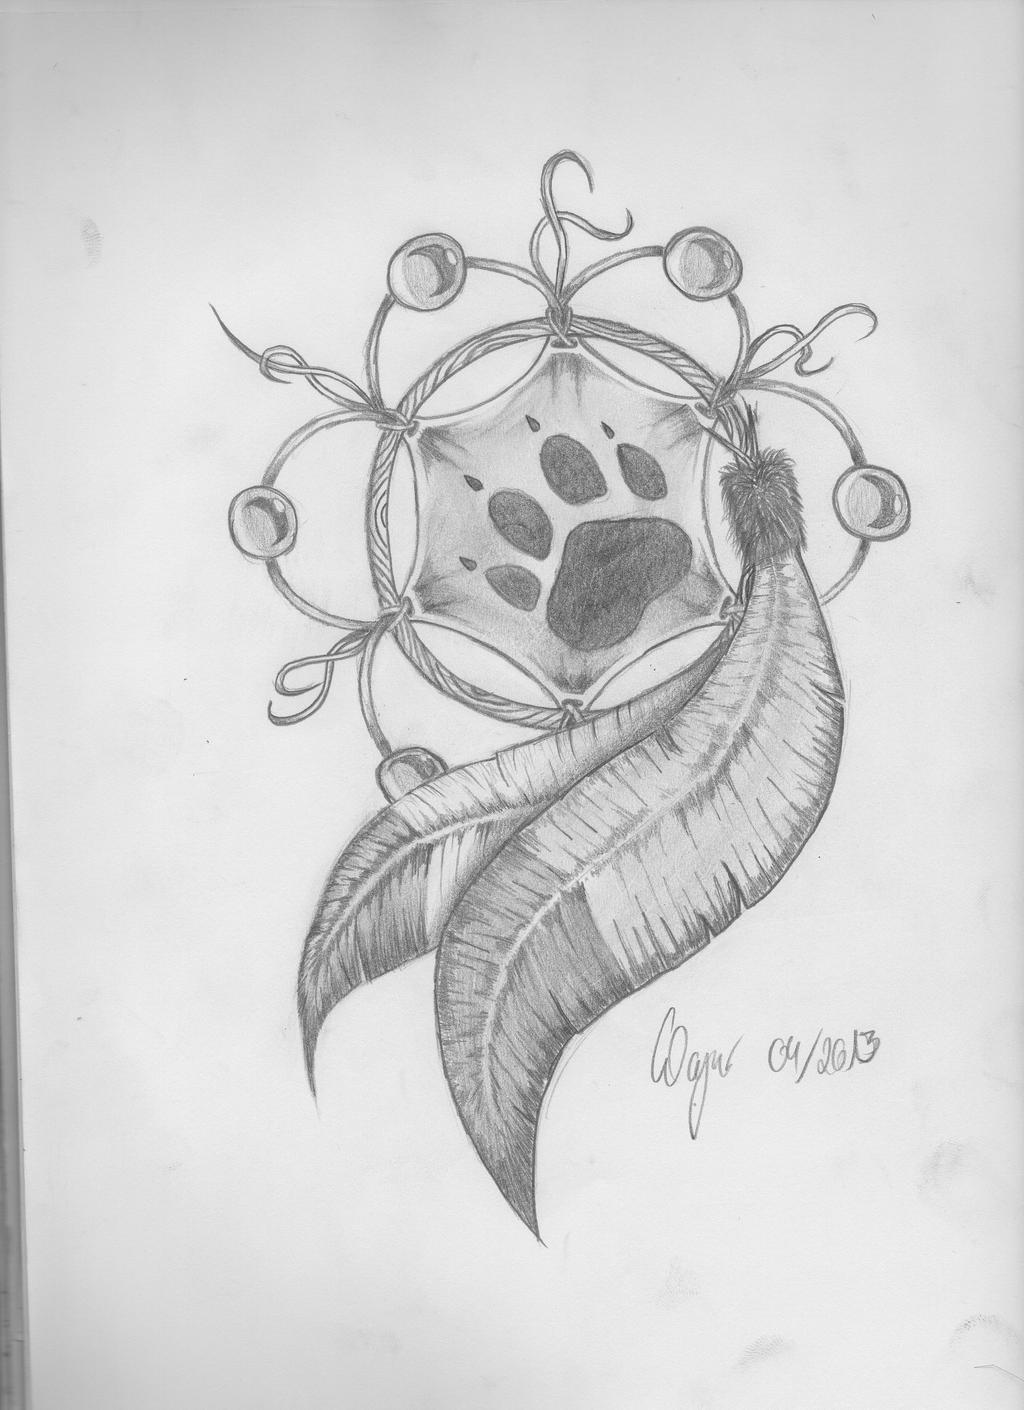 Traumfà Nger Tattoo: Traumfaenger By NimKaz On DeviantArt